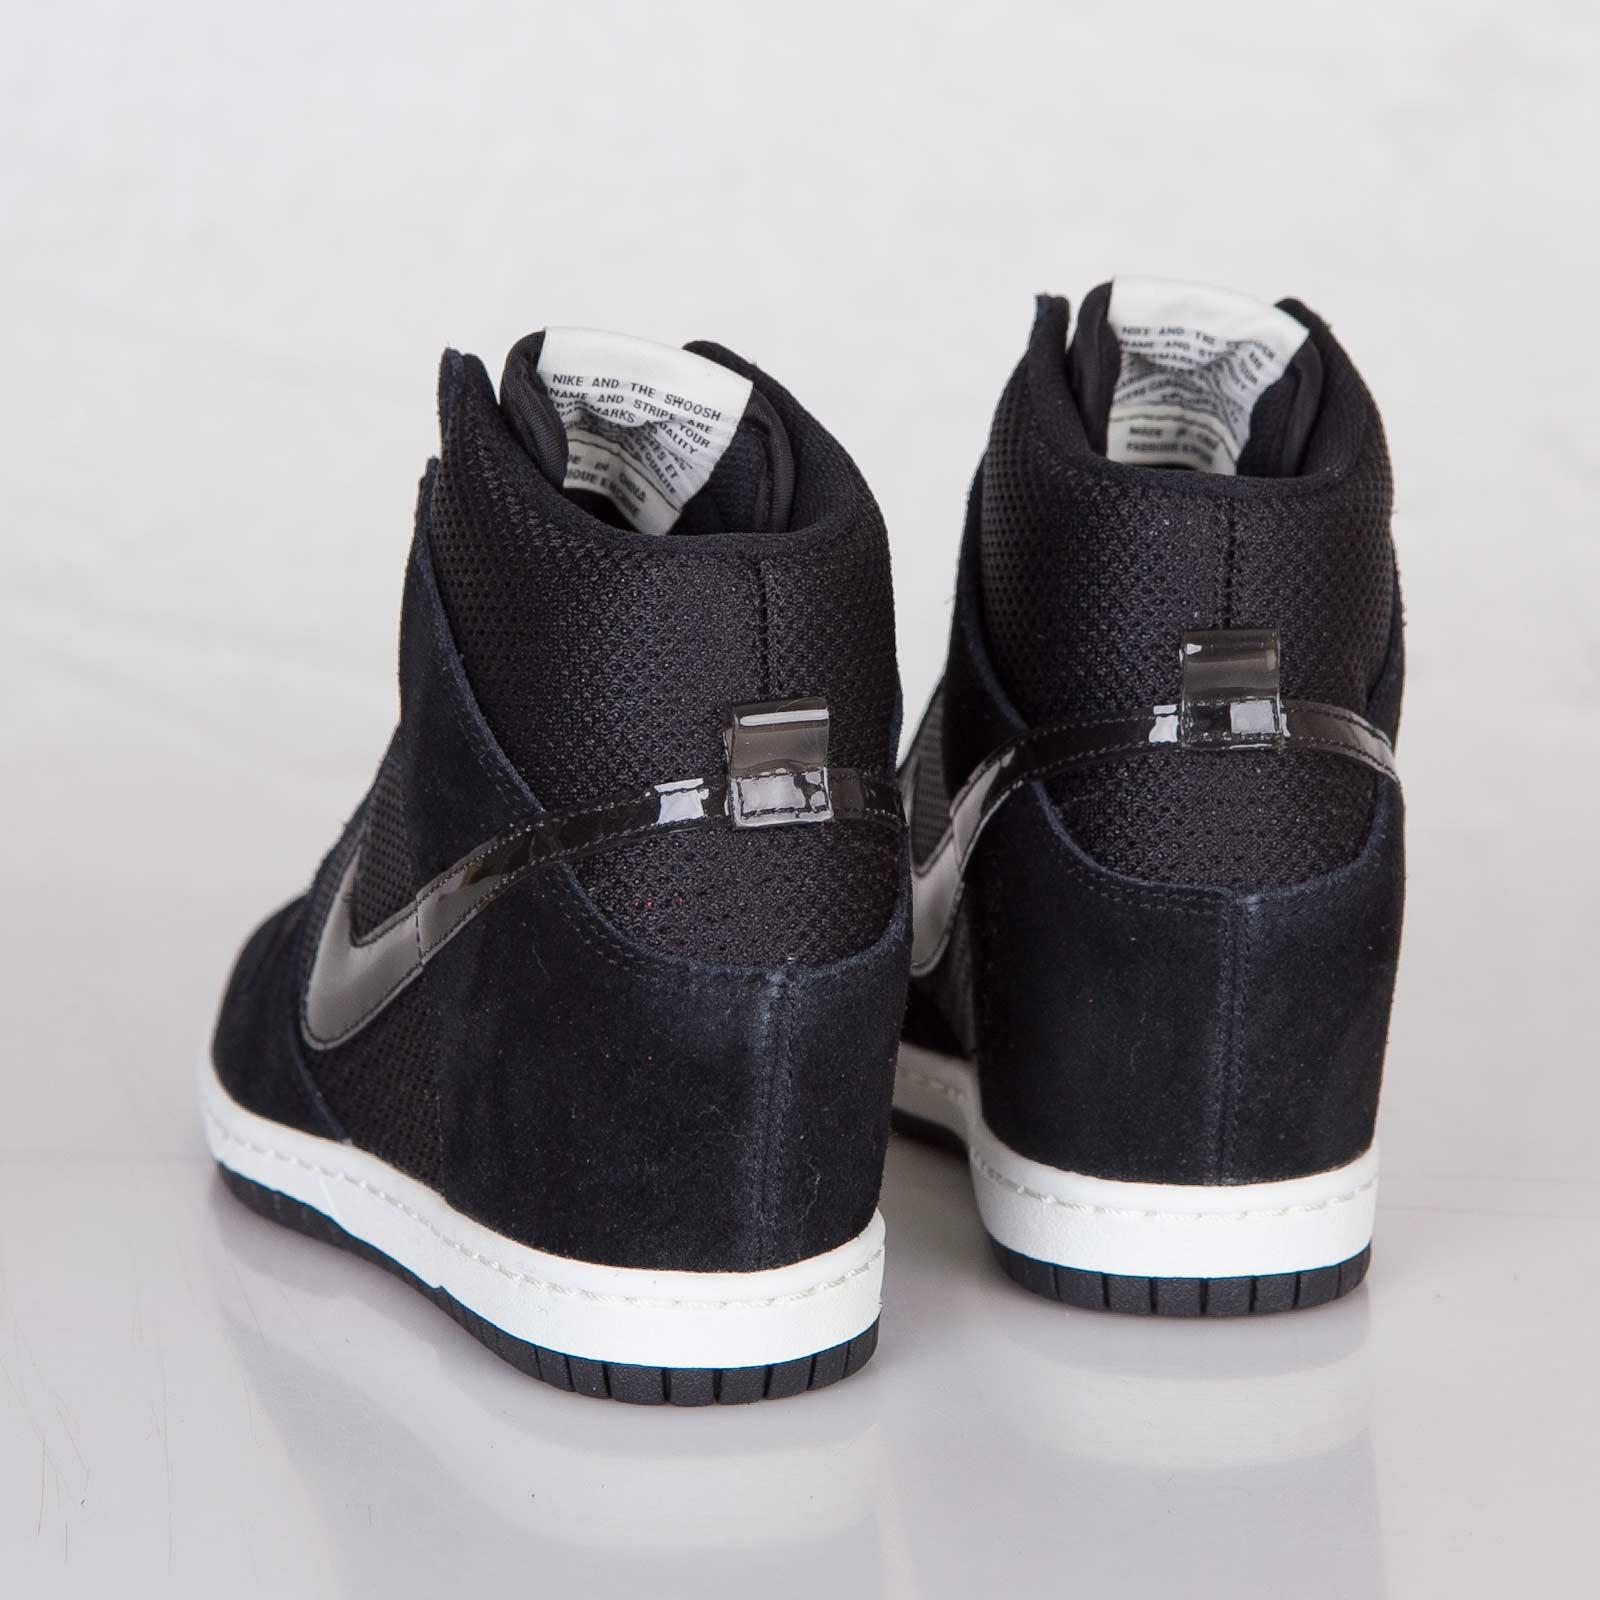 purchase cheap 3ecf0 a6ad9 Nike Wmns Dunk Sky Hi Essential - 644877-001 - Sneakersnstuff   sneakers    streetwear online since 1999